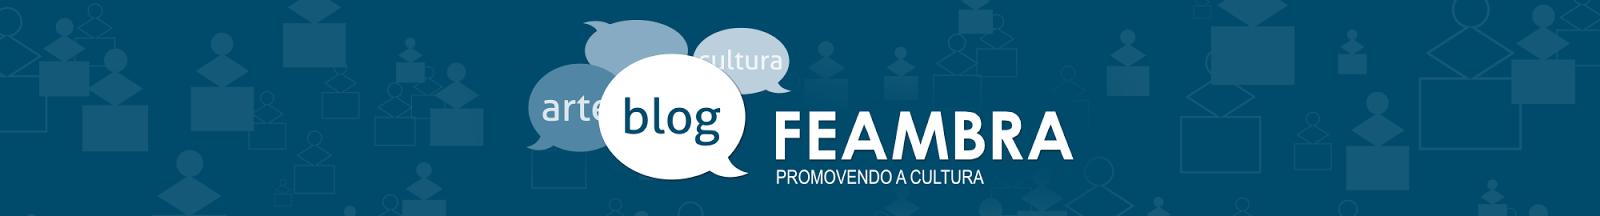 Blog FEAMBRA - Arte e Cultura